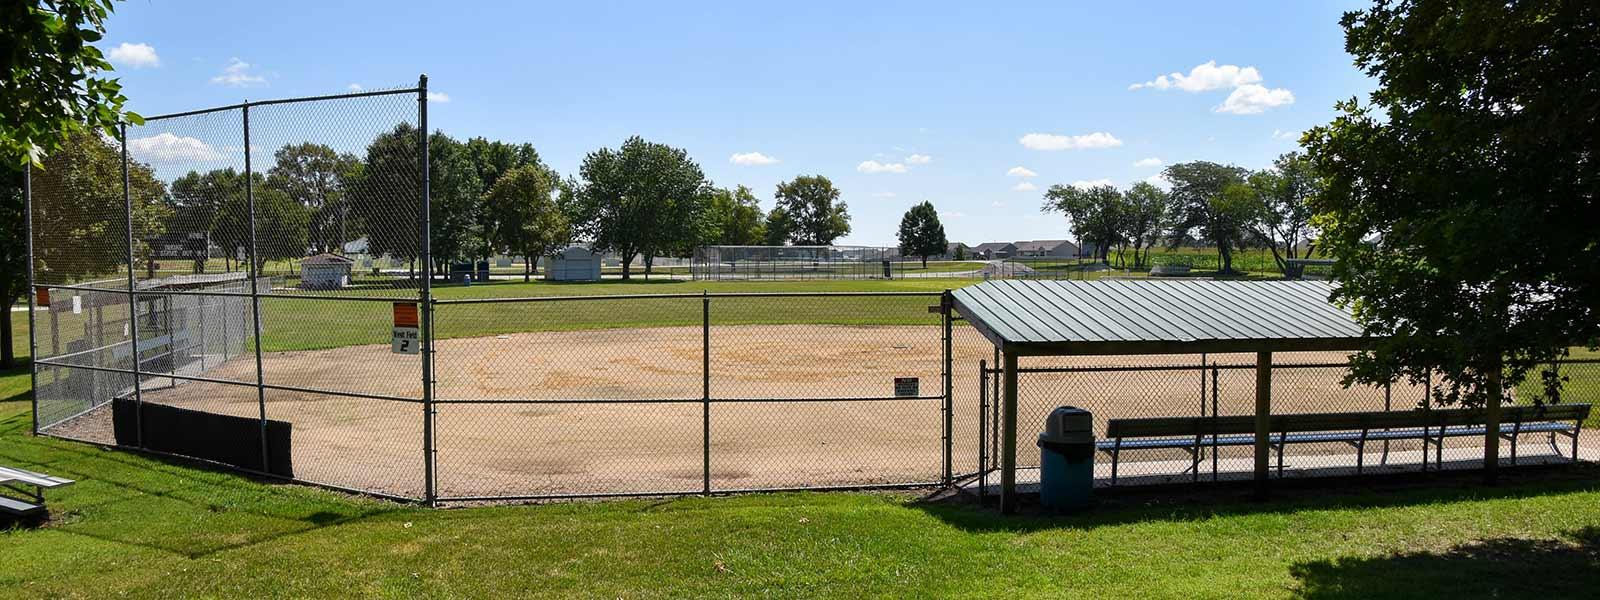 Edgewood Field